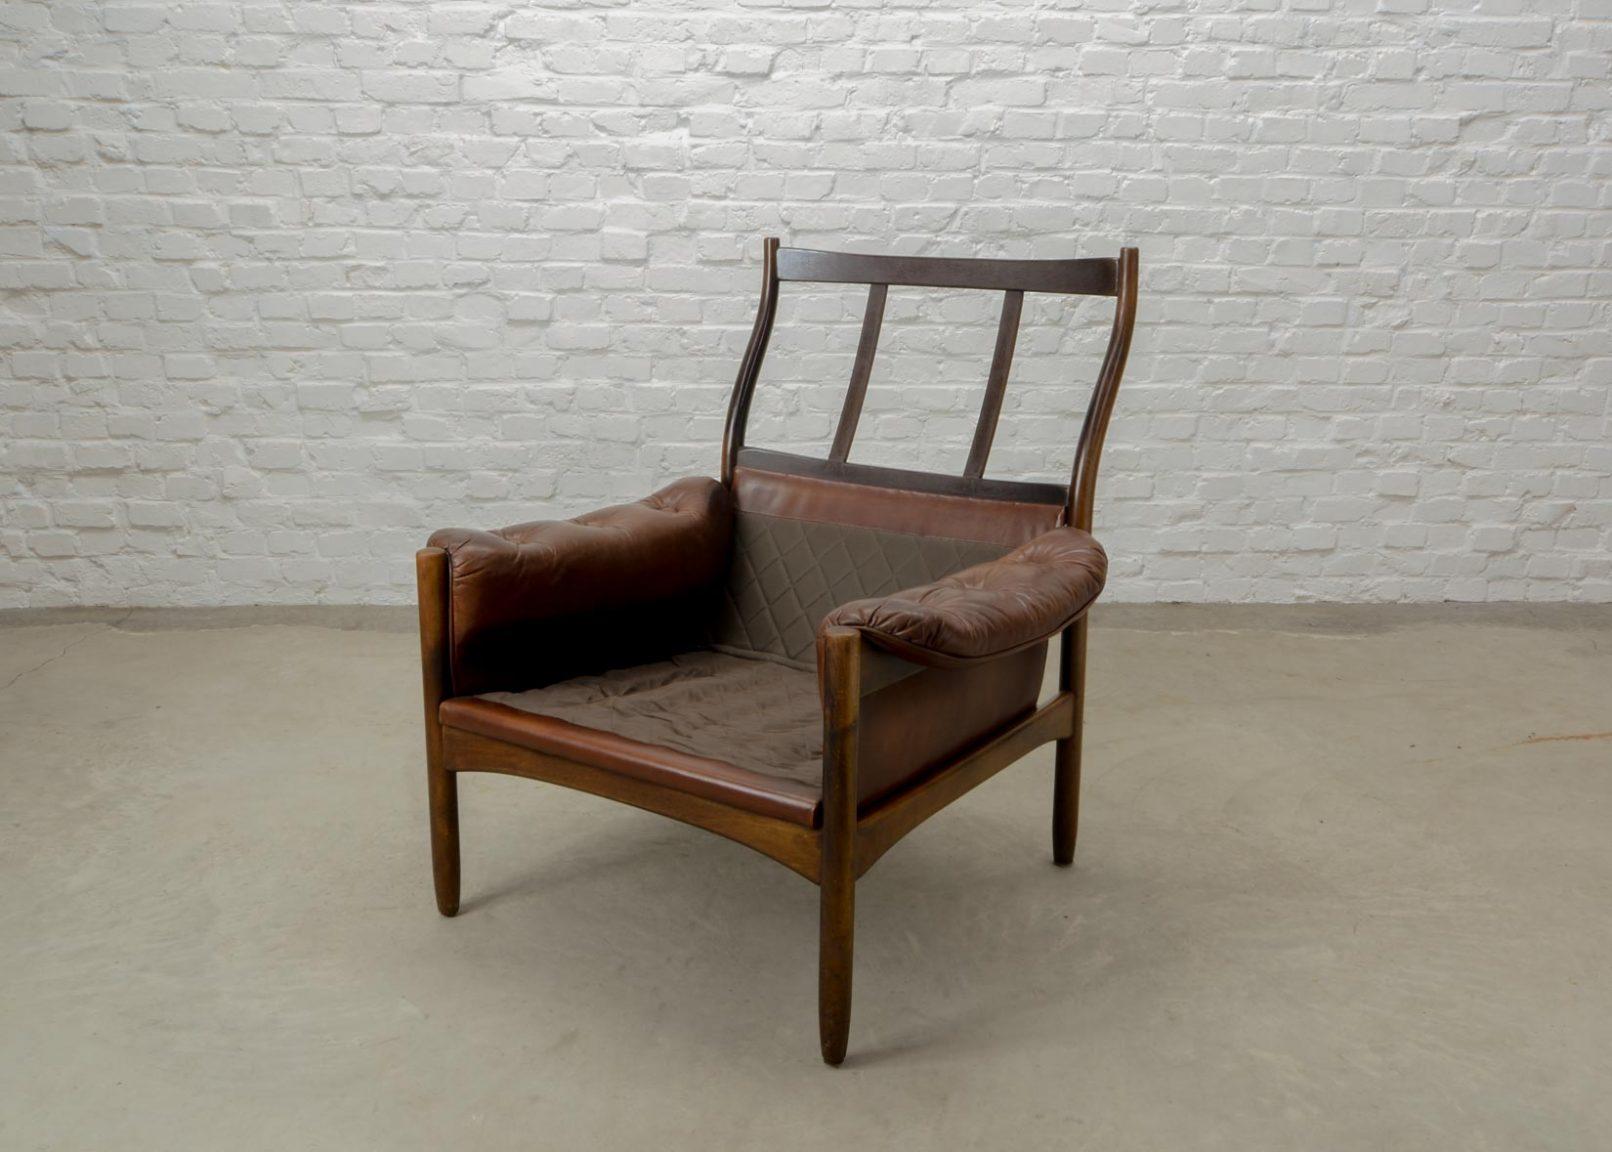 mid century scandinavian design chestnut leather lounge chair by g m bel sweden 1960s. Black Bedroom Furniture Sets. Home Design Ideas